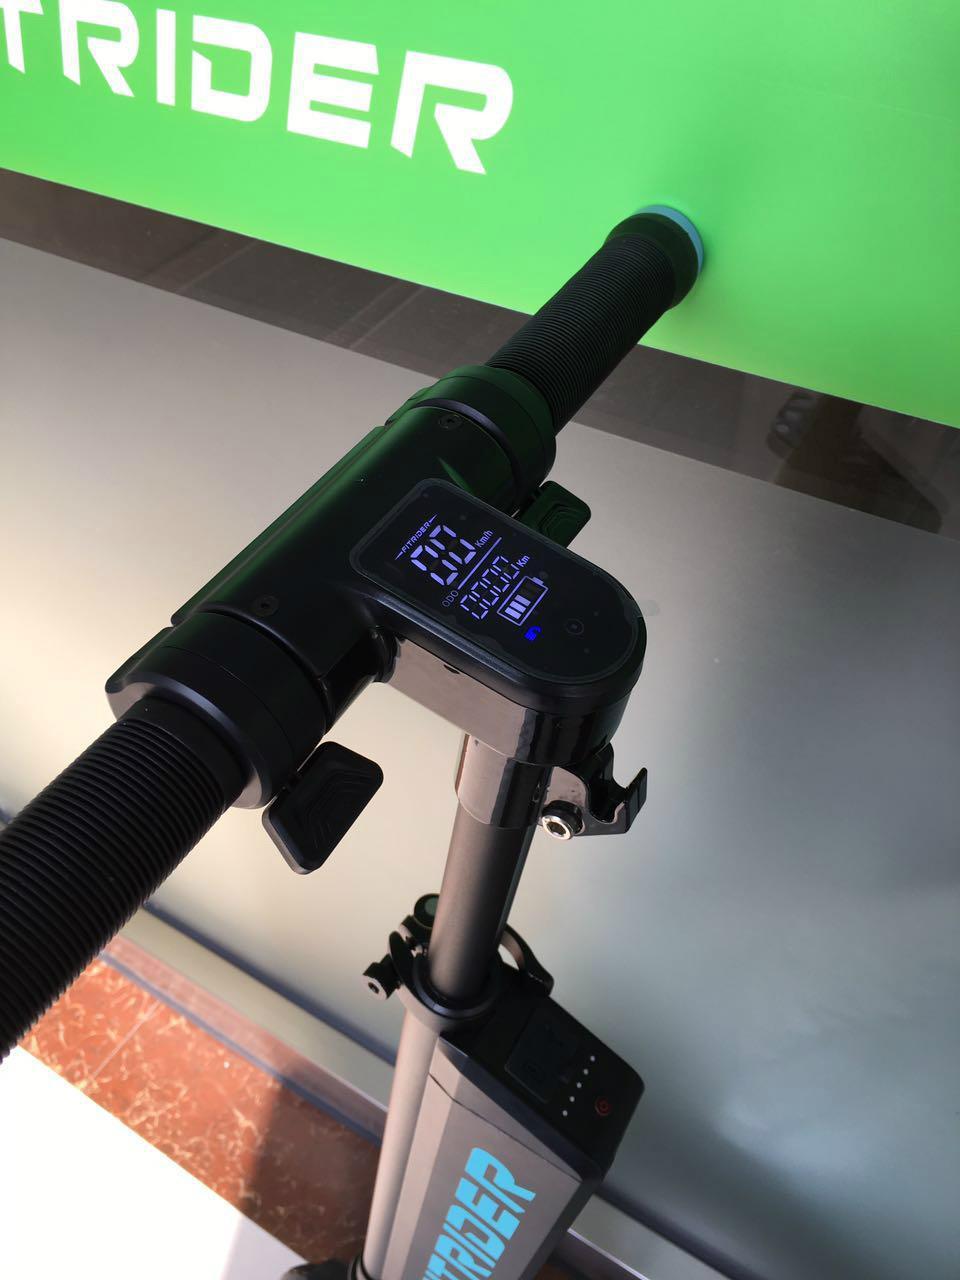 Fitrider 8寸電動滑板車T1S小型折疊迷你電動車 5